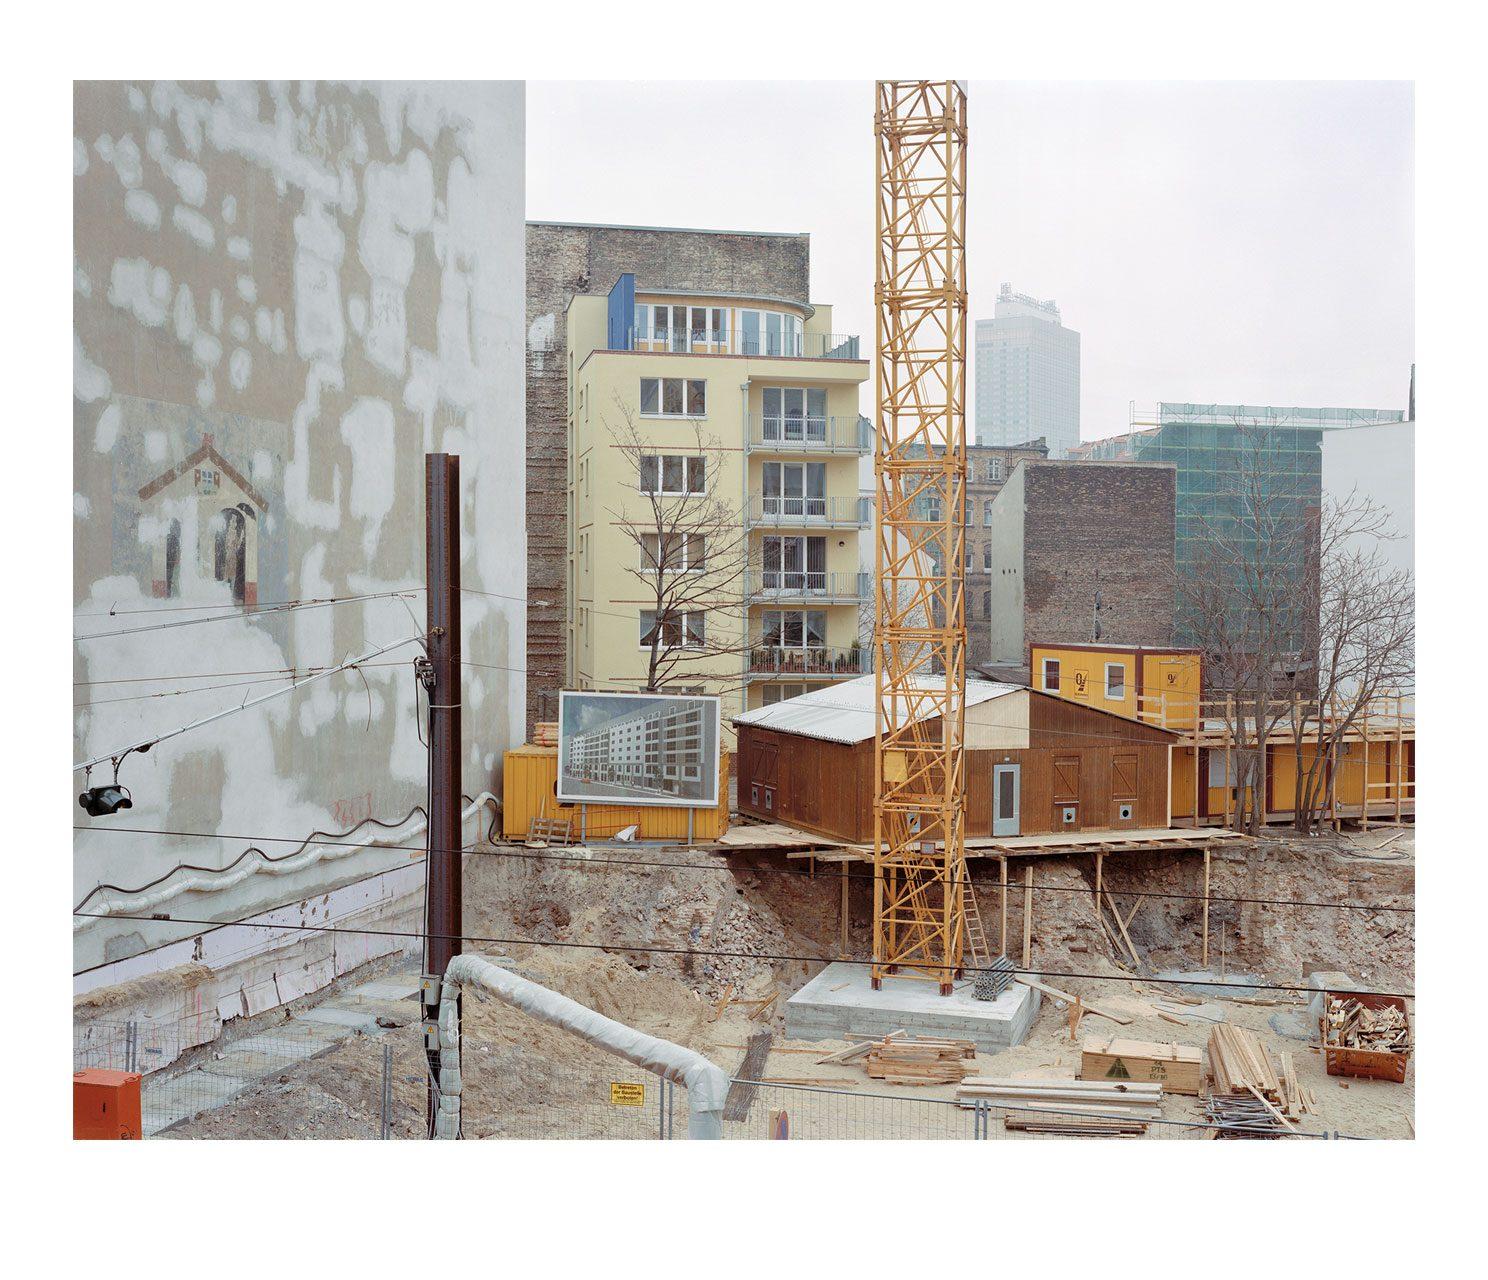 Stadt #15, Rosenthaler Strasse, 1997